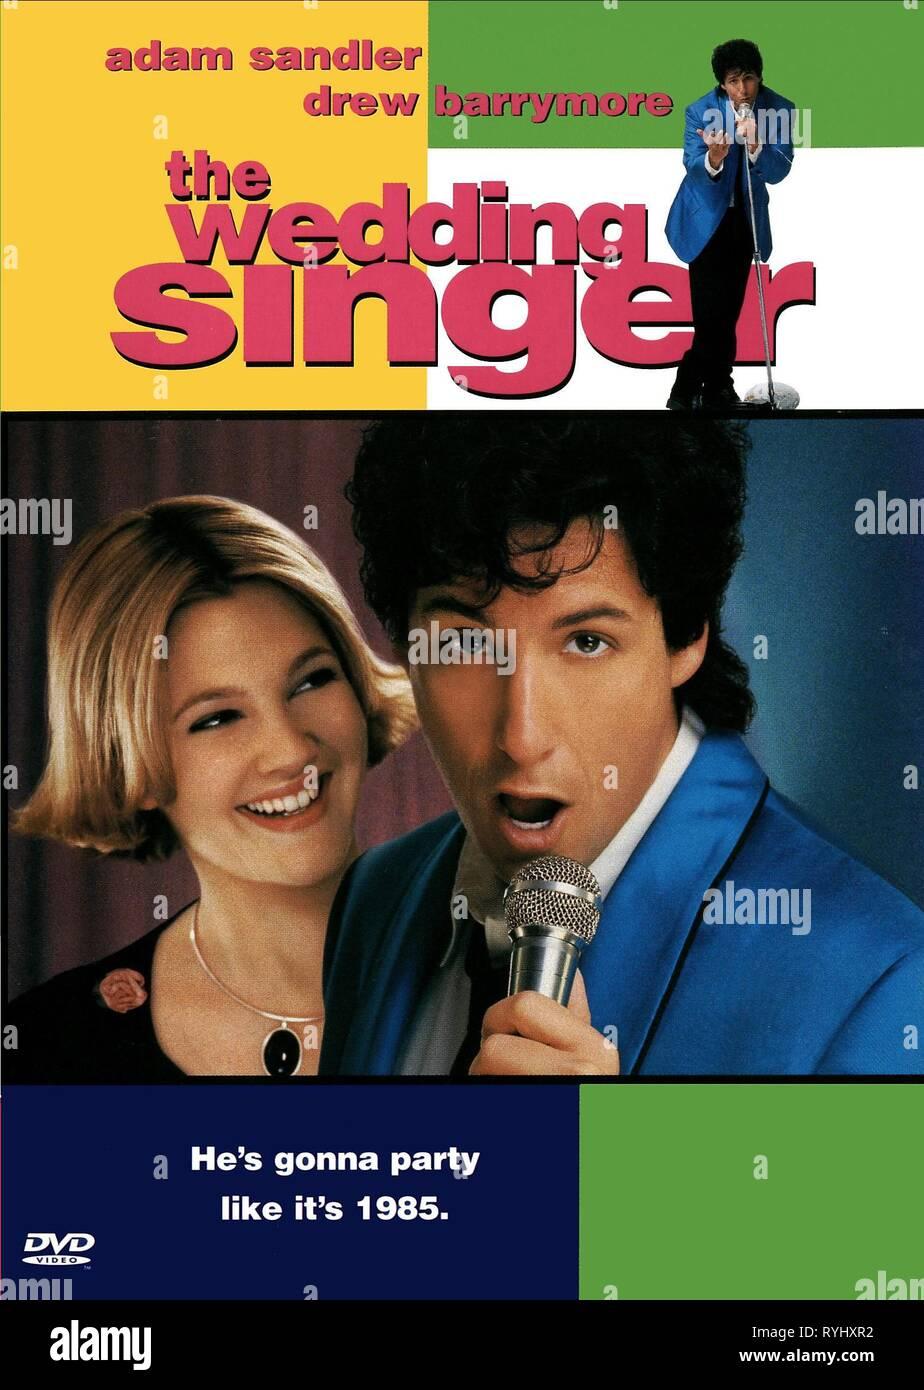 DREW BARRYMORE, ADAM SANDLER POSTER, THE WEDDING SINGER, 1998 ...